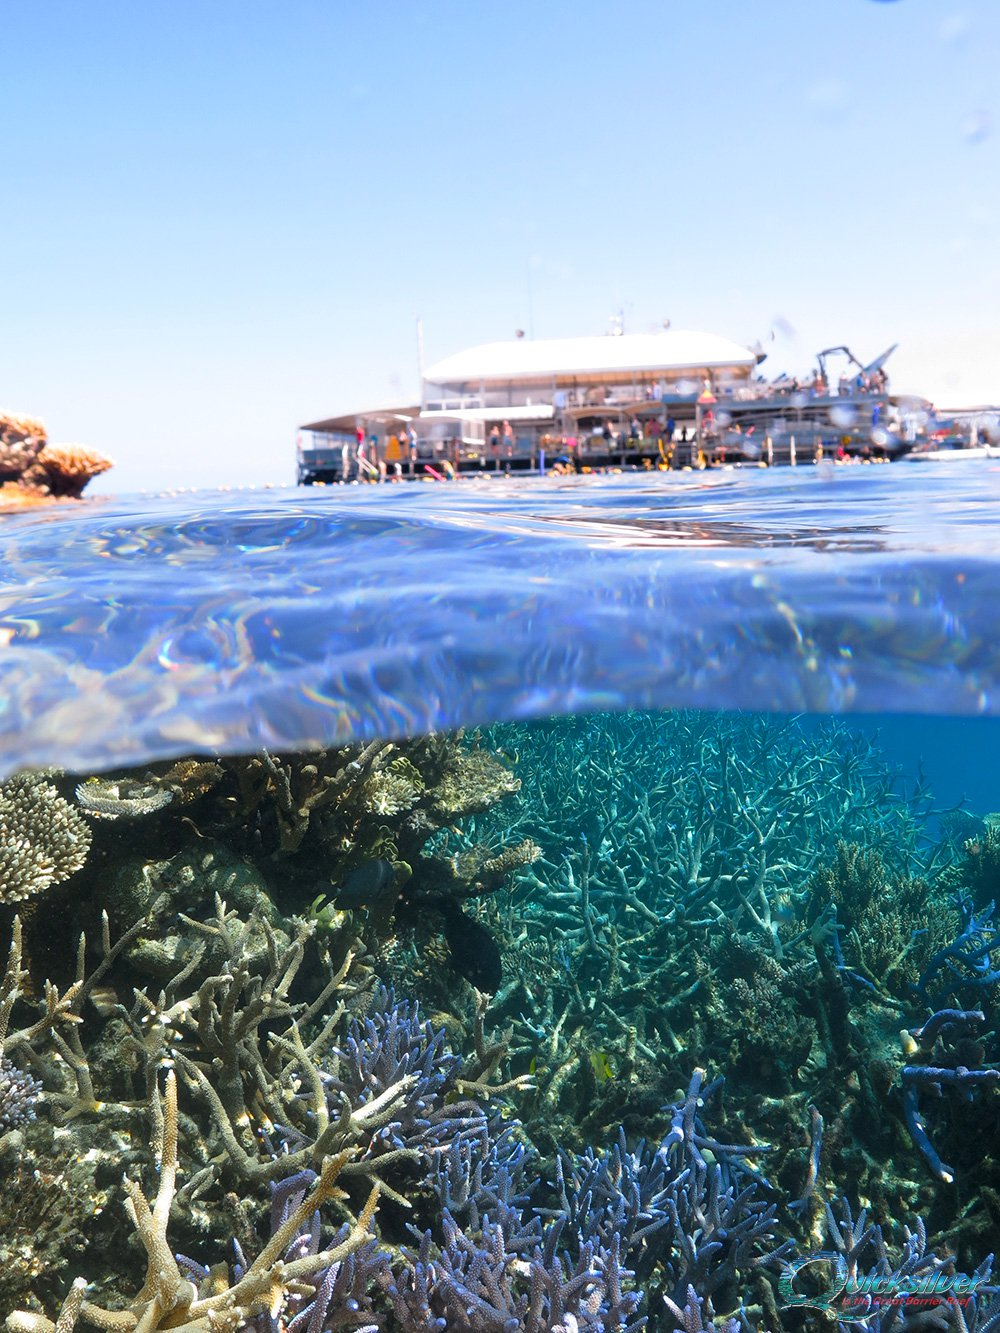 Agincourt-outer-barrier-reef-pontoon-platform-inbg.jpg